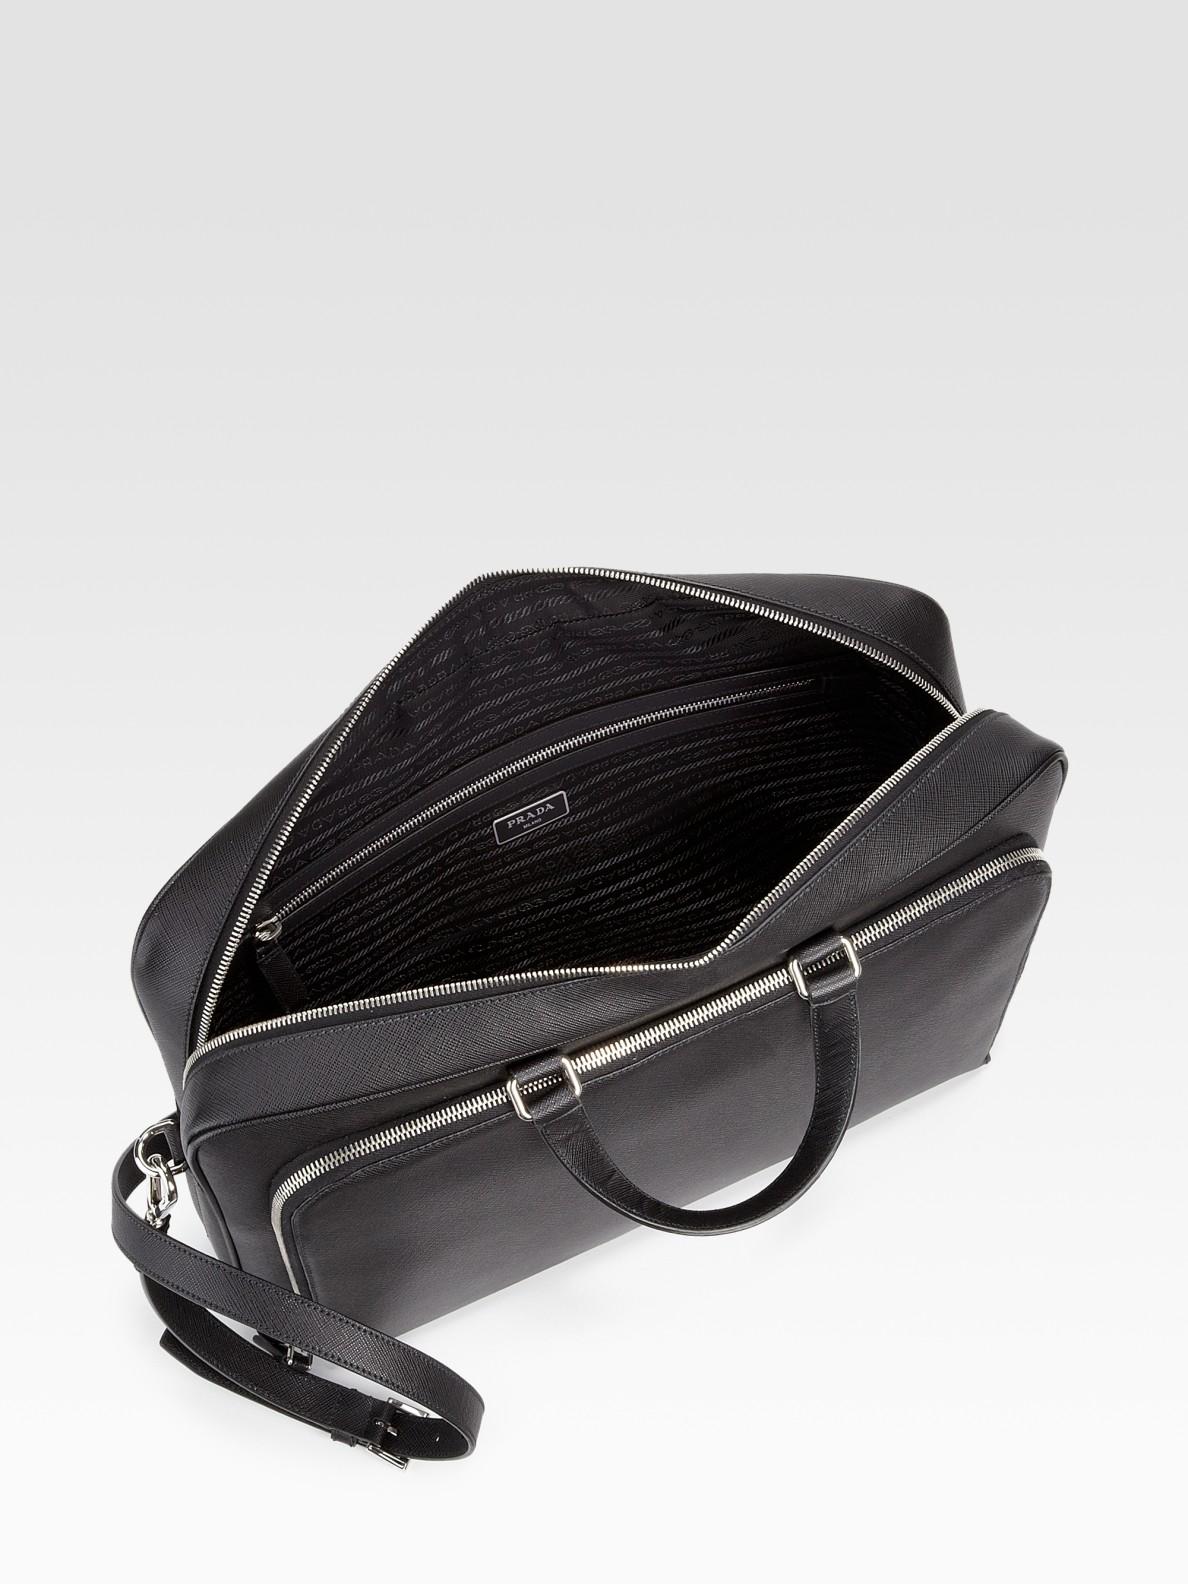 Prada Saffiano Leather Zip Briefcase in Black for Men | Lyst